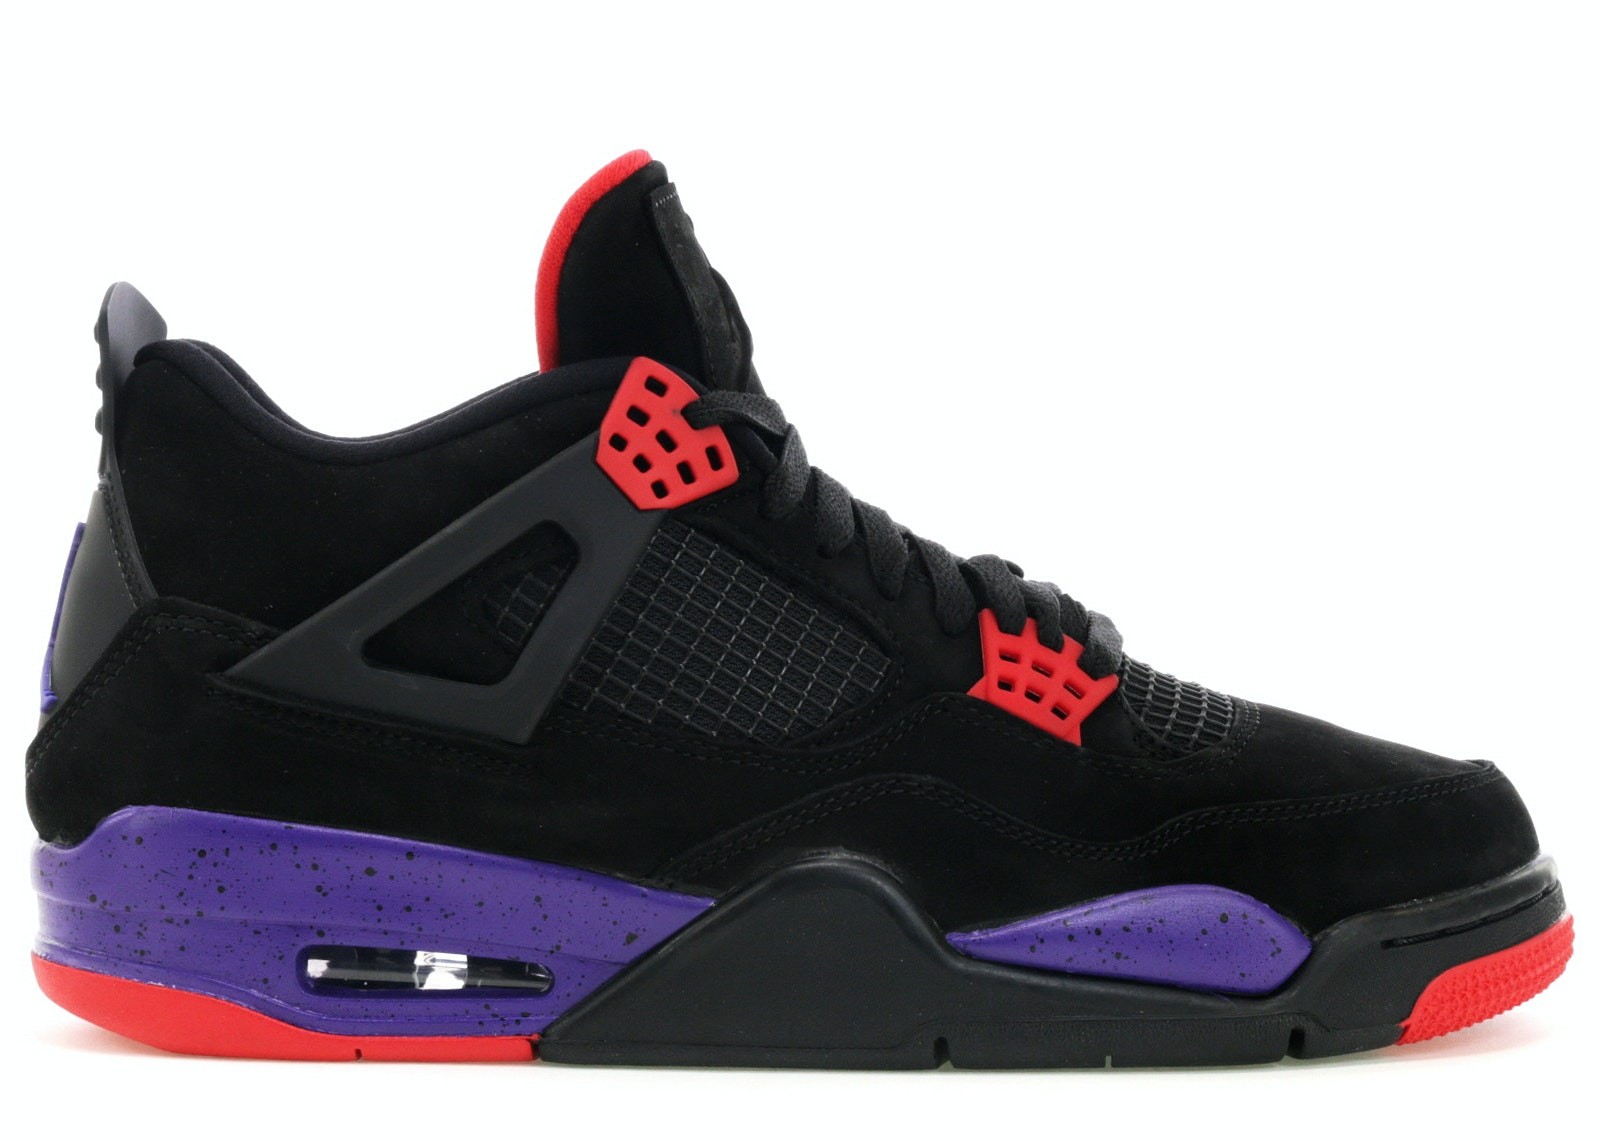 Jordan 4 Retro Raptors